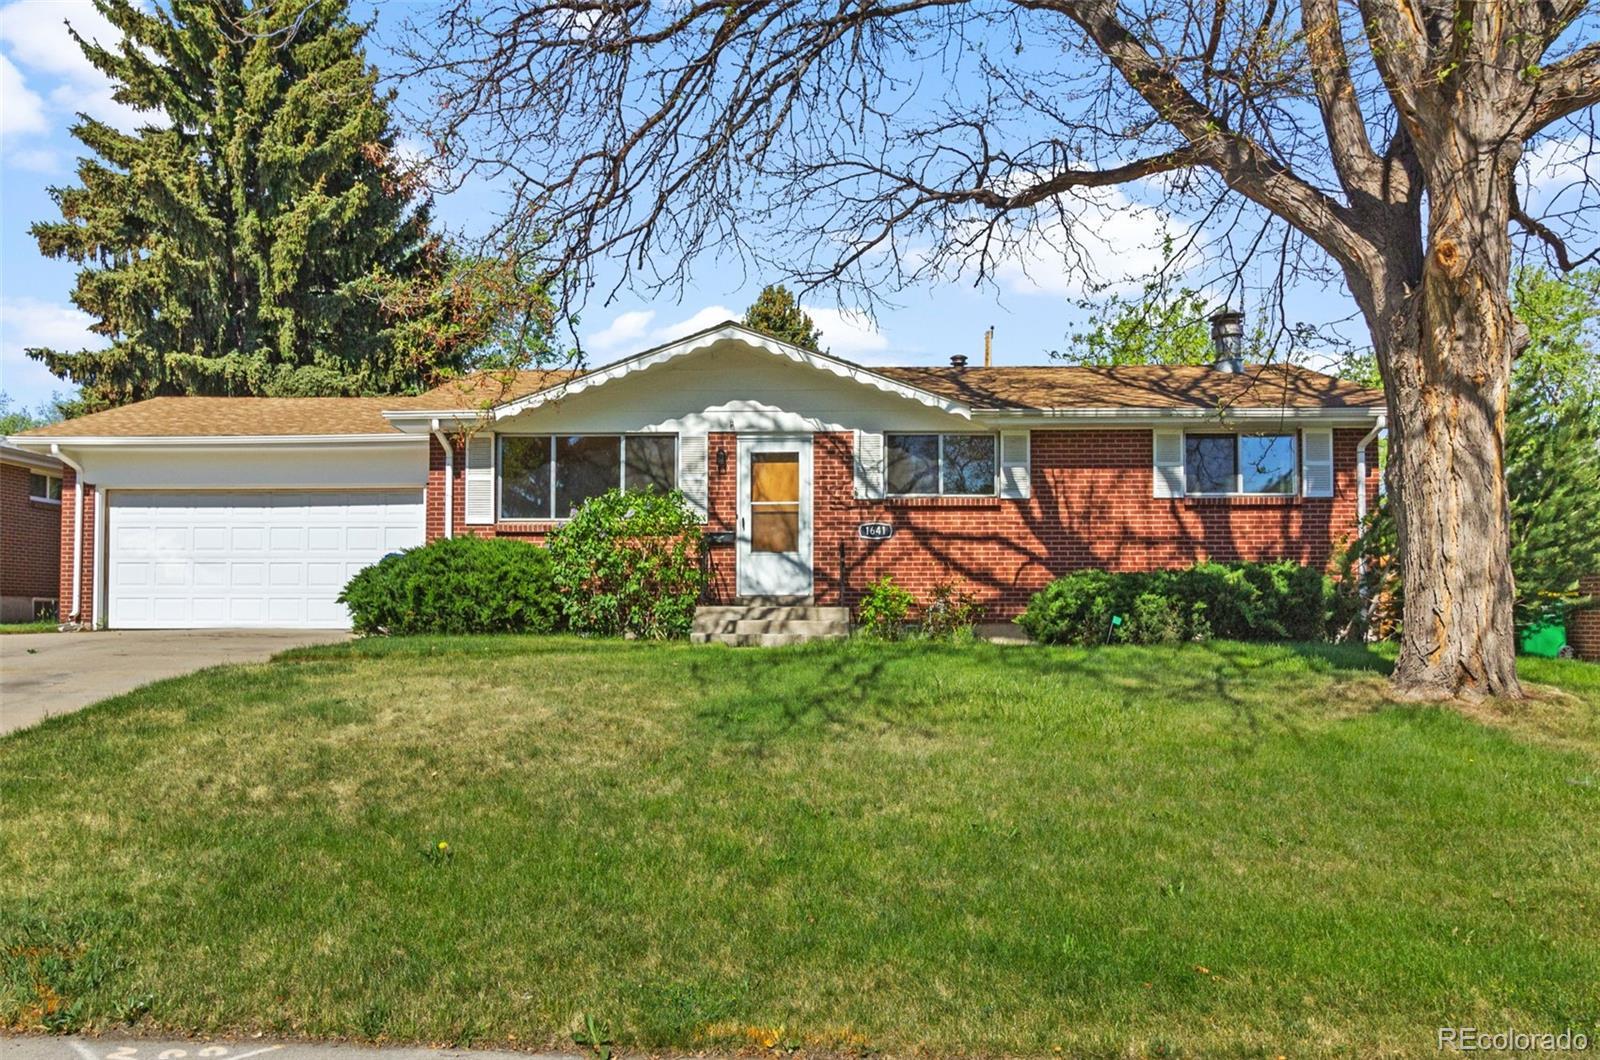 1641 S Allison Street, Lakewood, CO 80232 - Lakewood, CO real estate listing